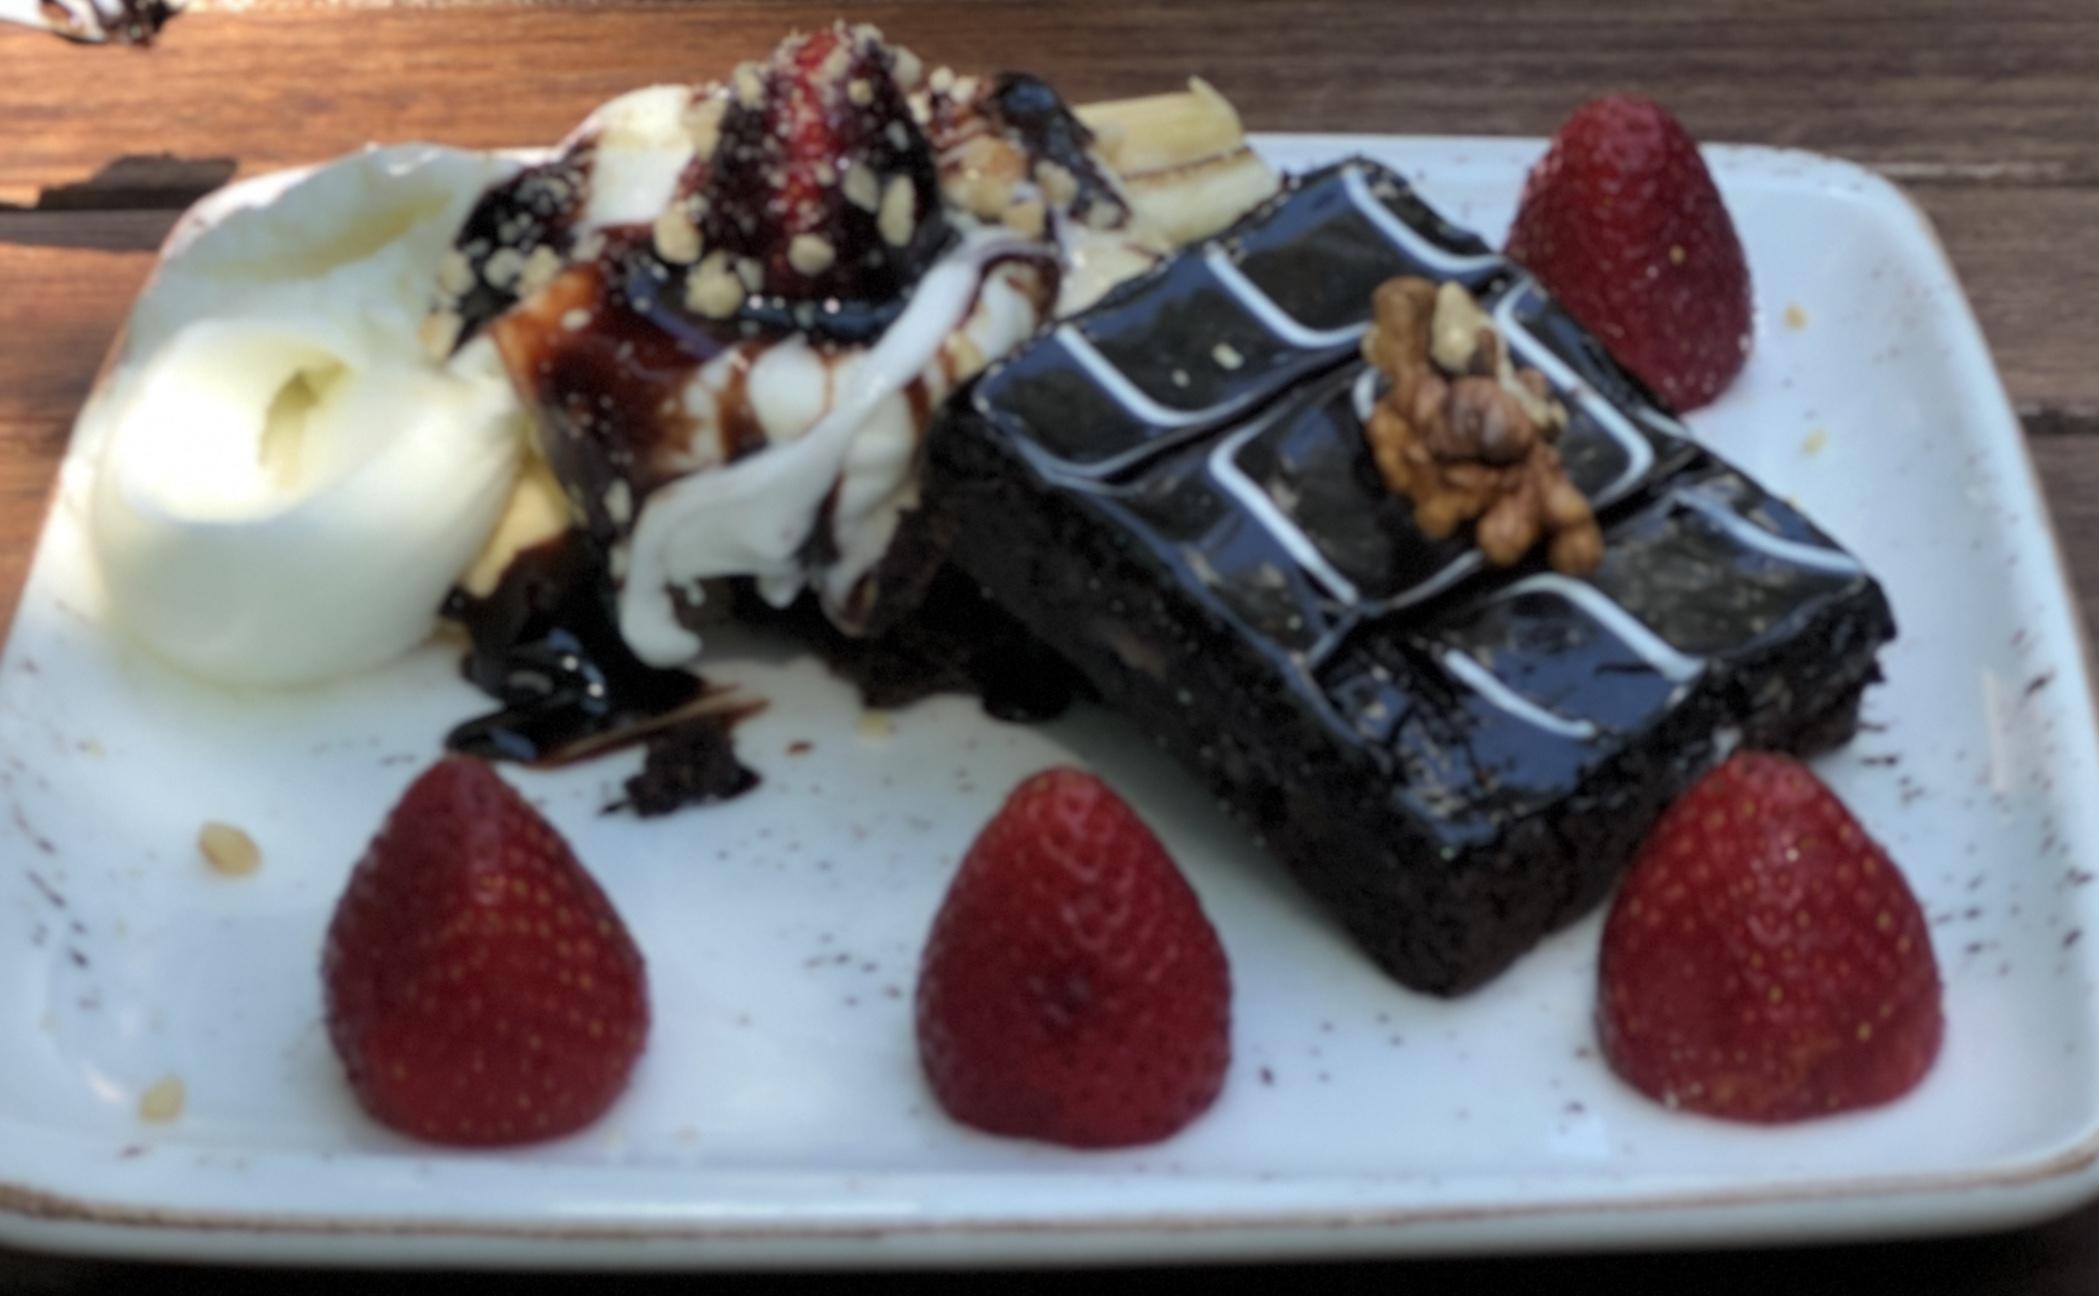 Loss Garden Cafe | BROWNE SHOW